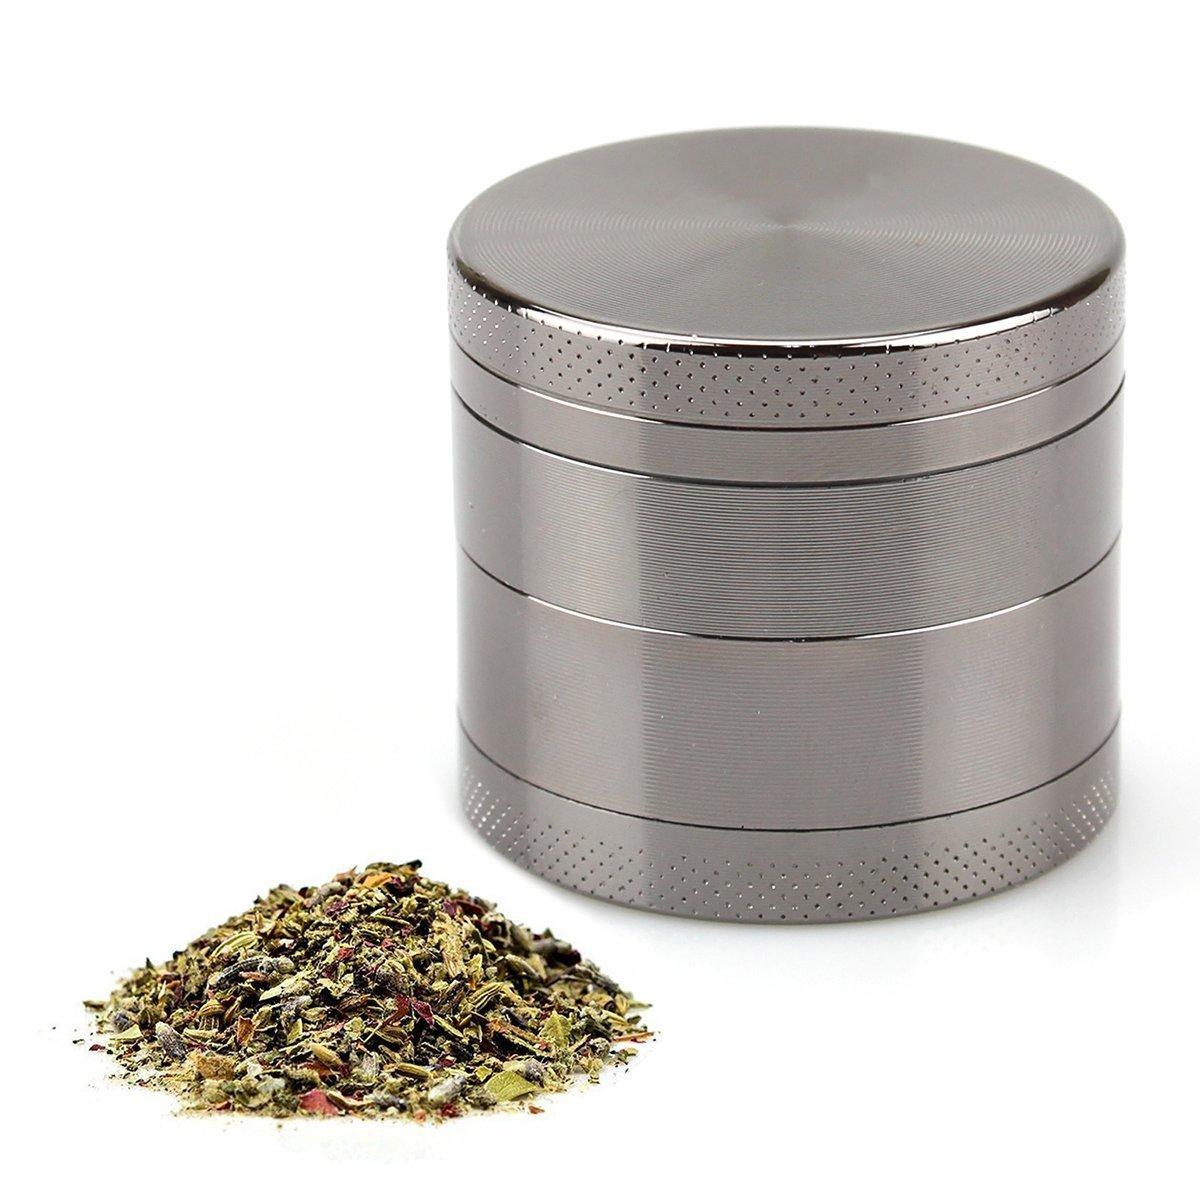 4Piece Tobacco Spice Herb Grinder/Mill–Zinc Alloy Naisidier